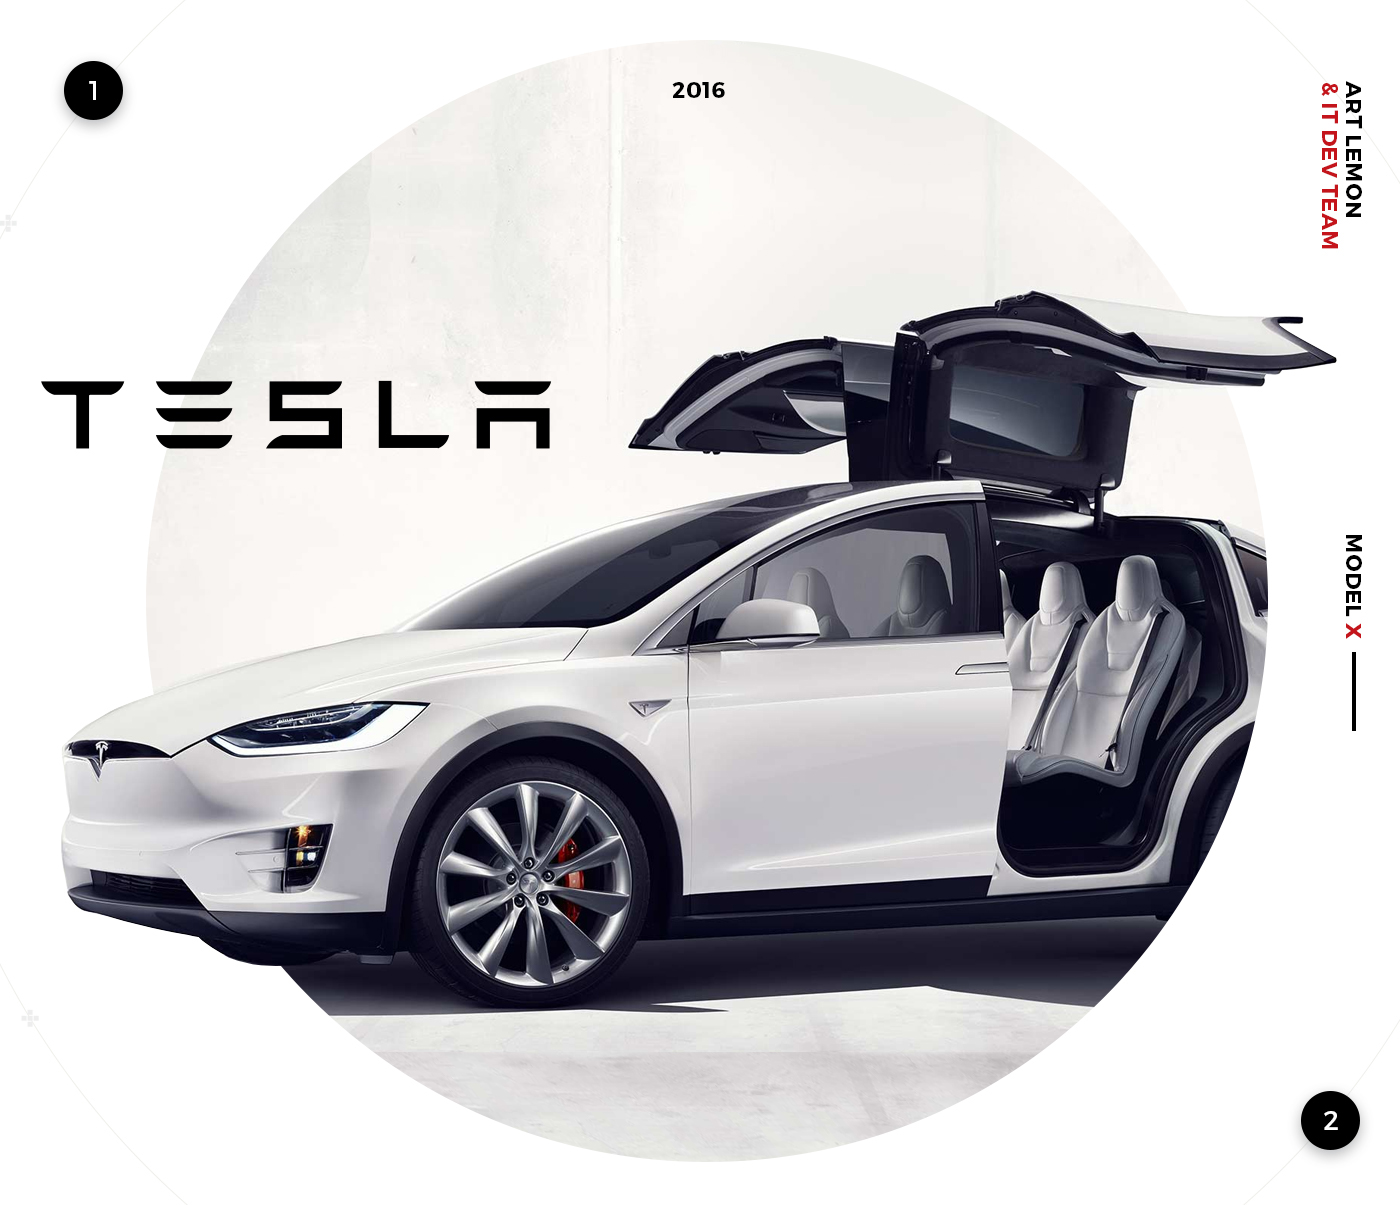 Tesla Model X On Behance # Tefla Muebles Sl